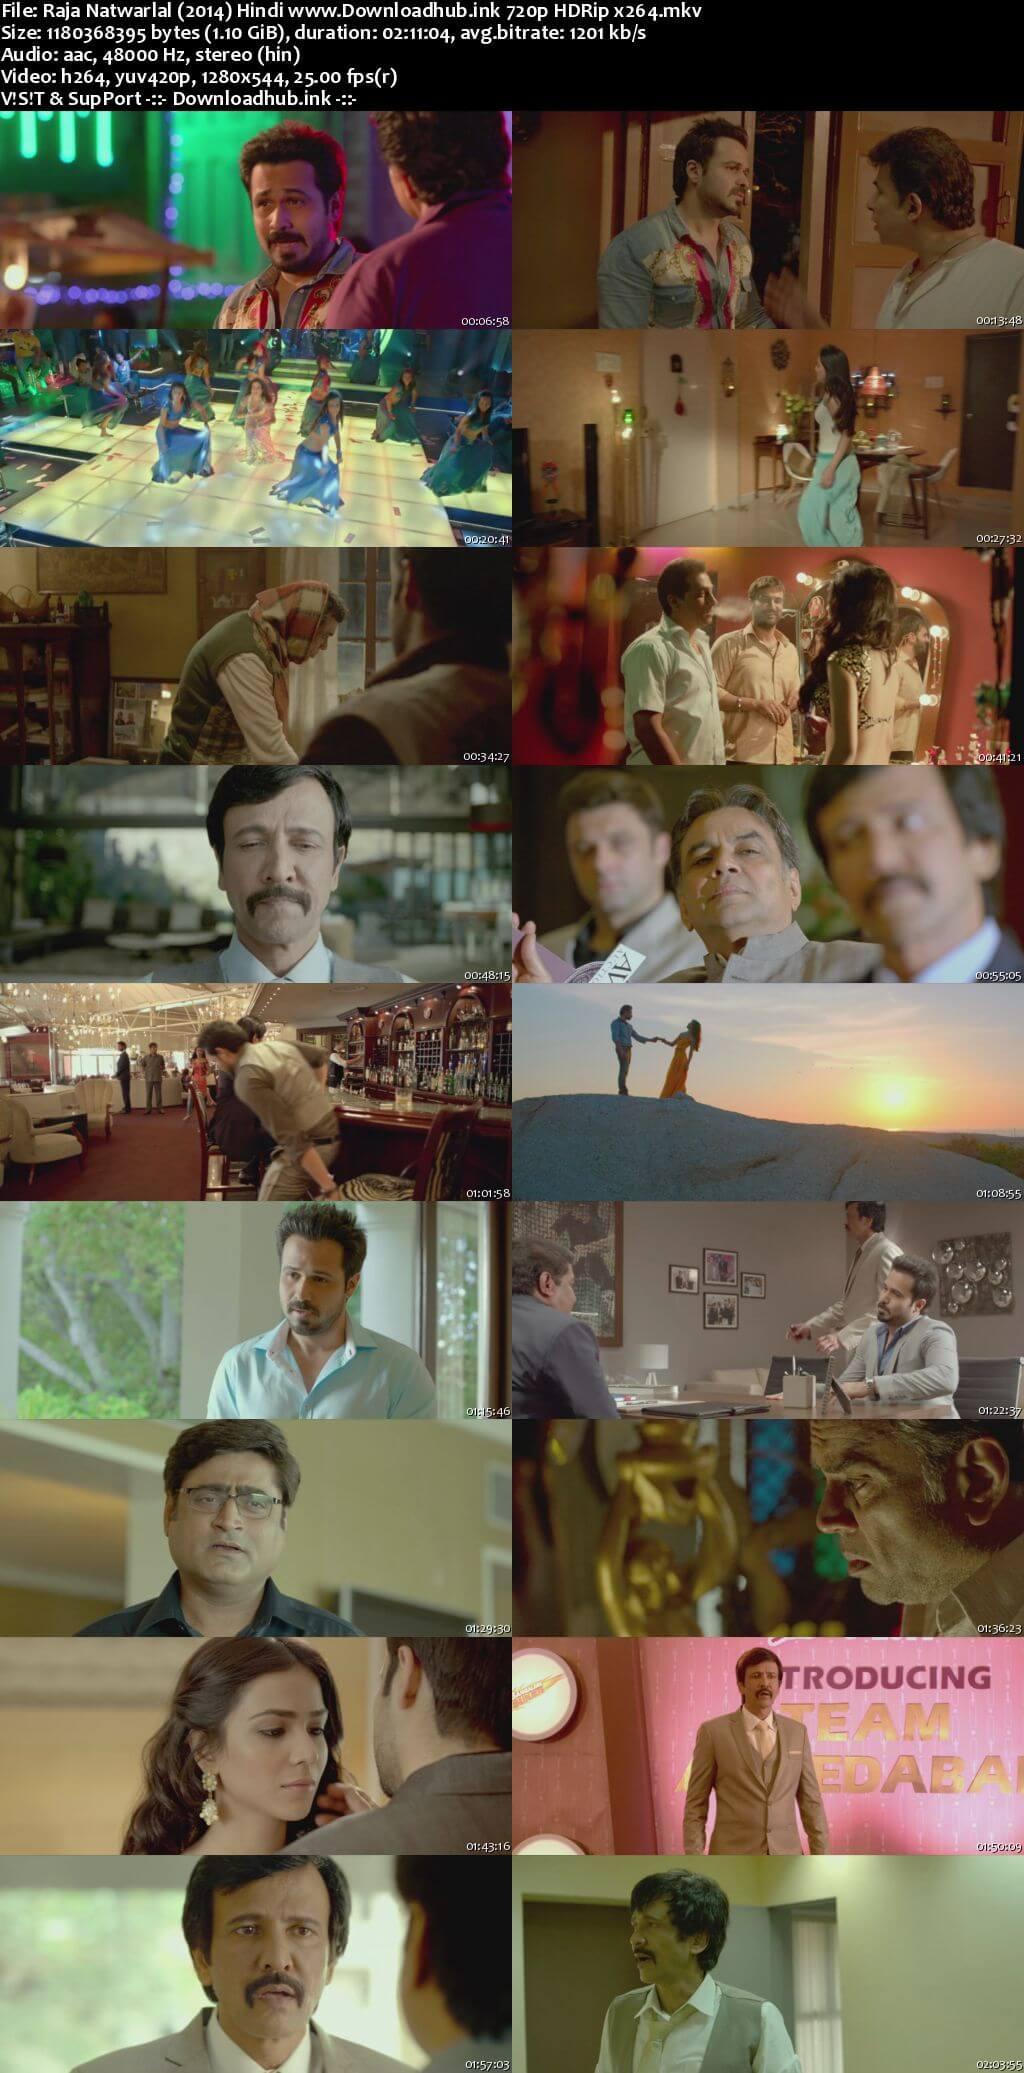 Raja Natwarlal 2014 Hindi 720p HDRip x264